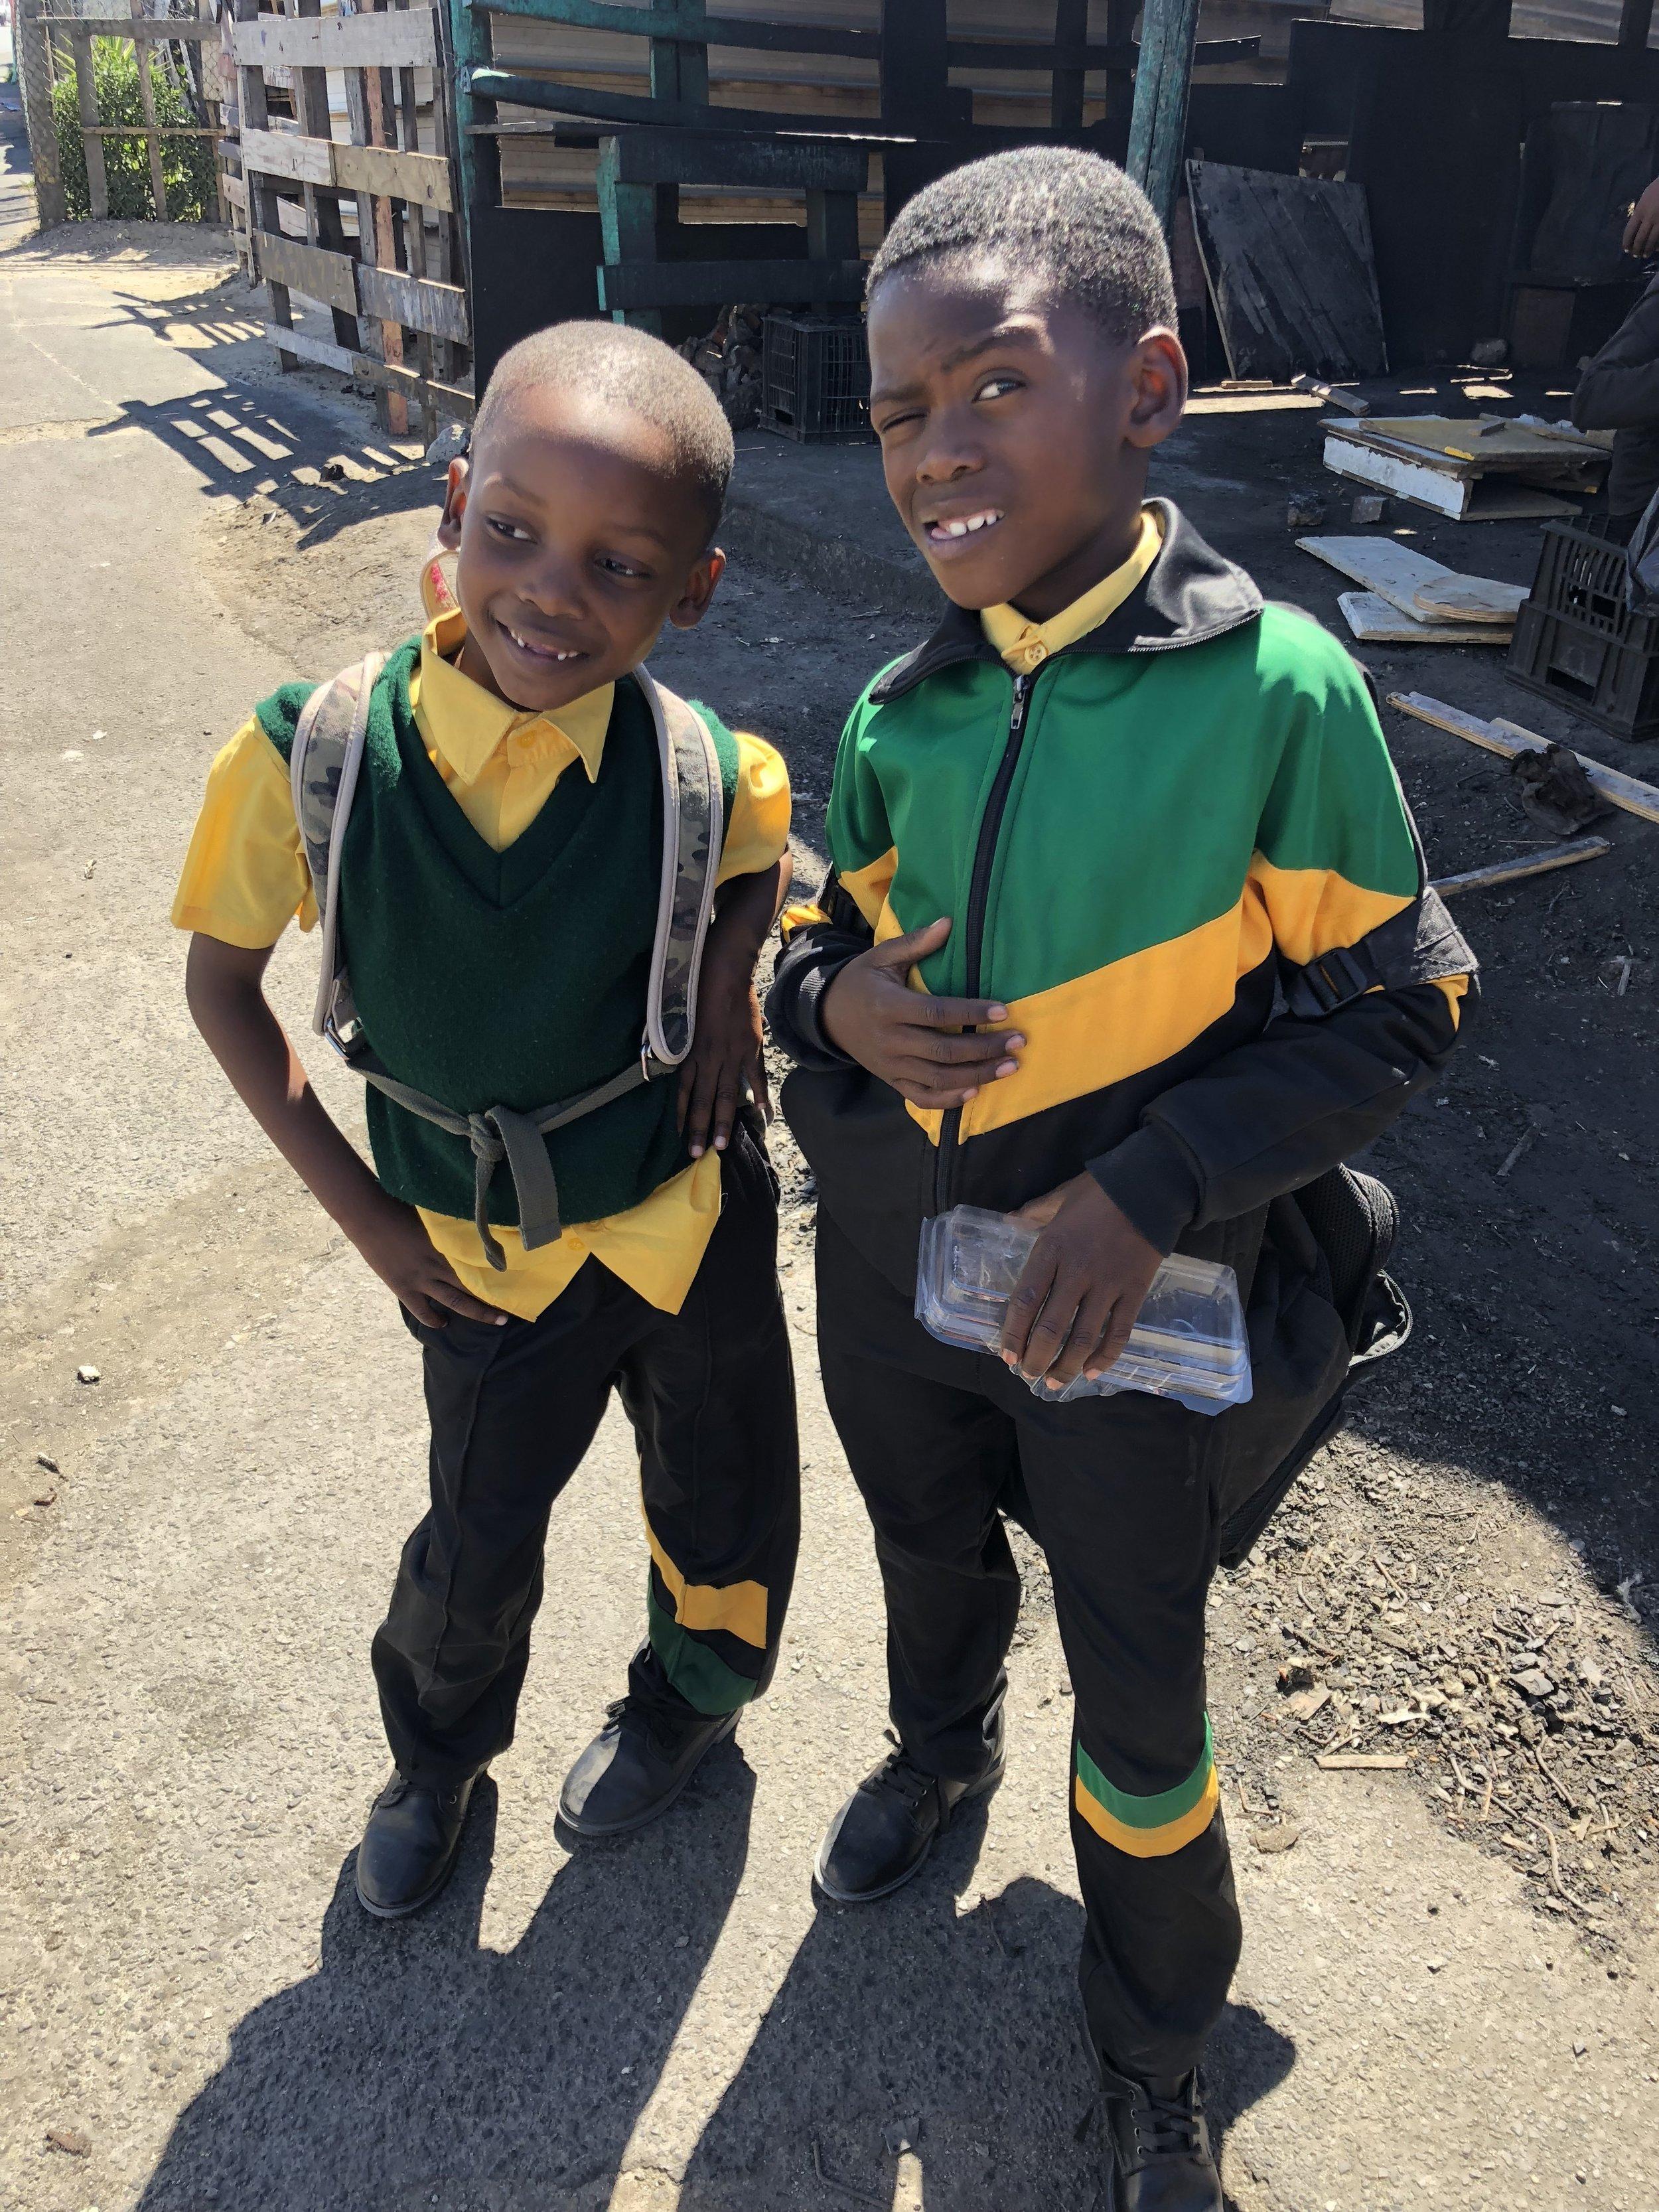 Khayelitsha township boys on their way home from school.